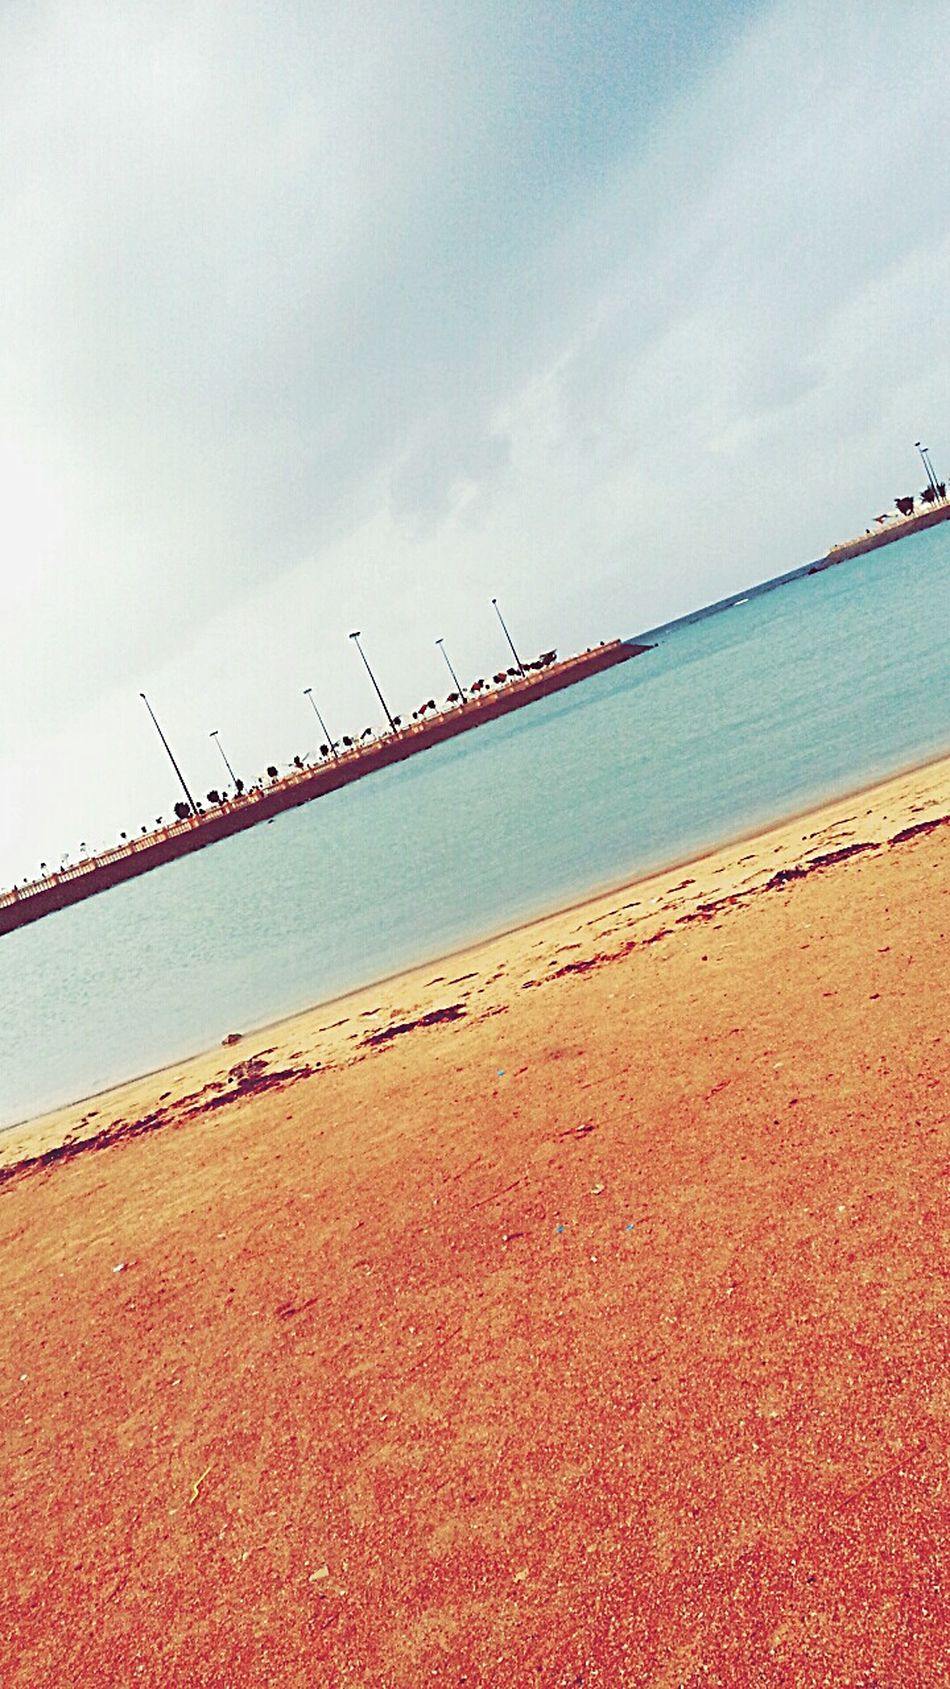 Sea And Sky بحر_جدة كلنا_مصورون صباح_الغيوم